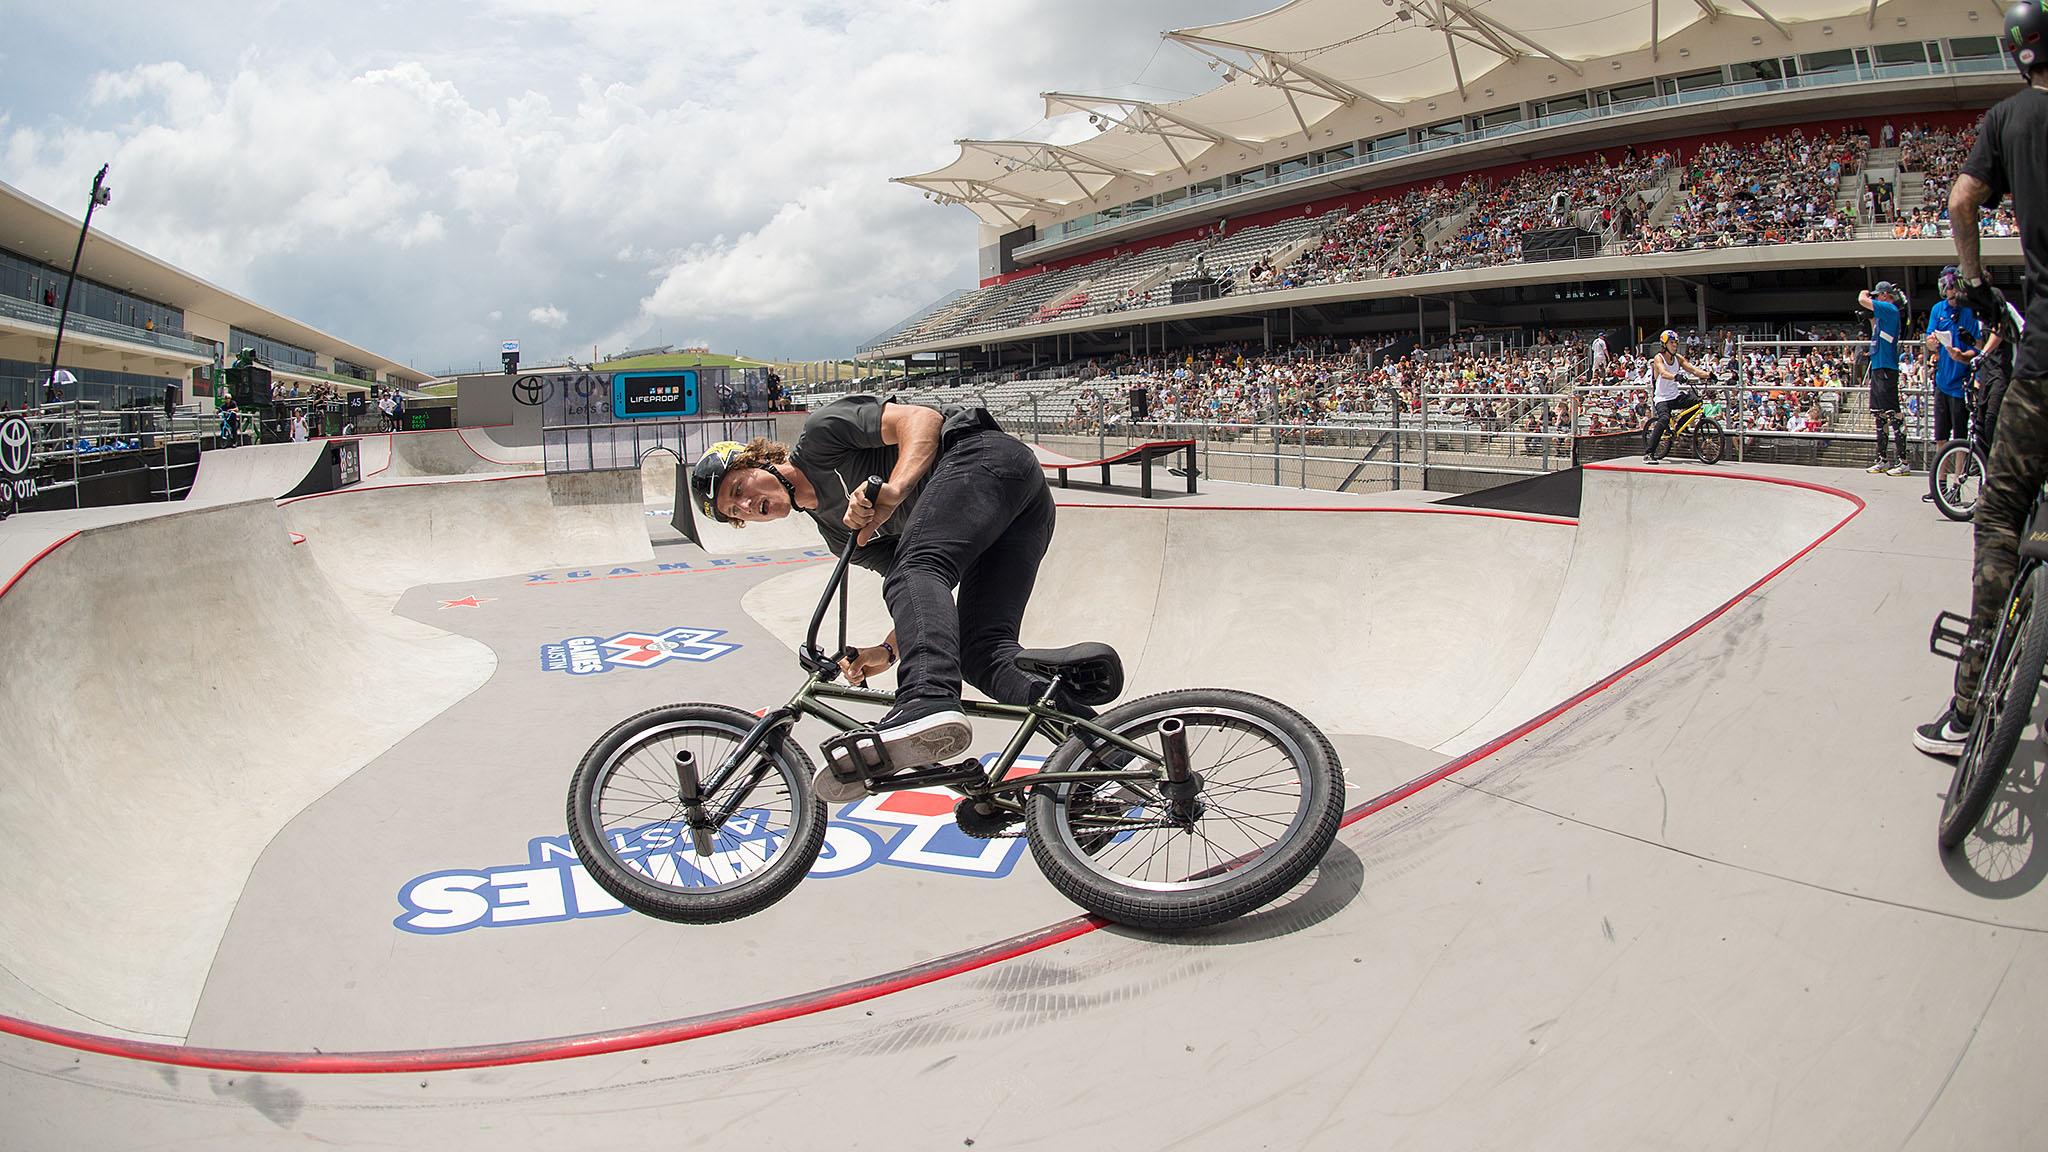 BMX Park final ~ Dennis Enarson